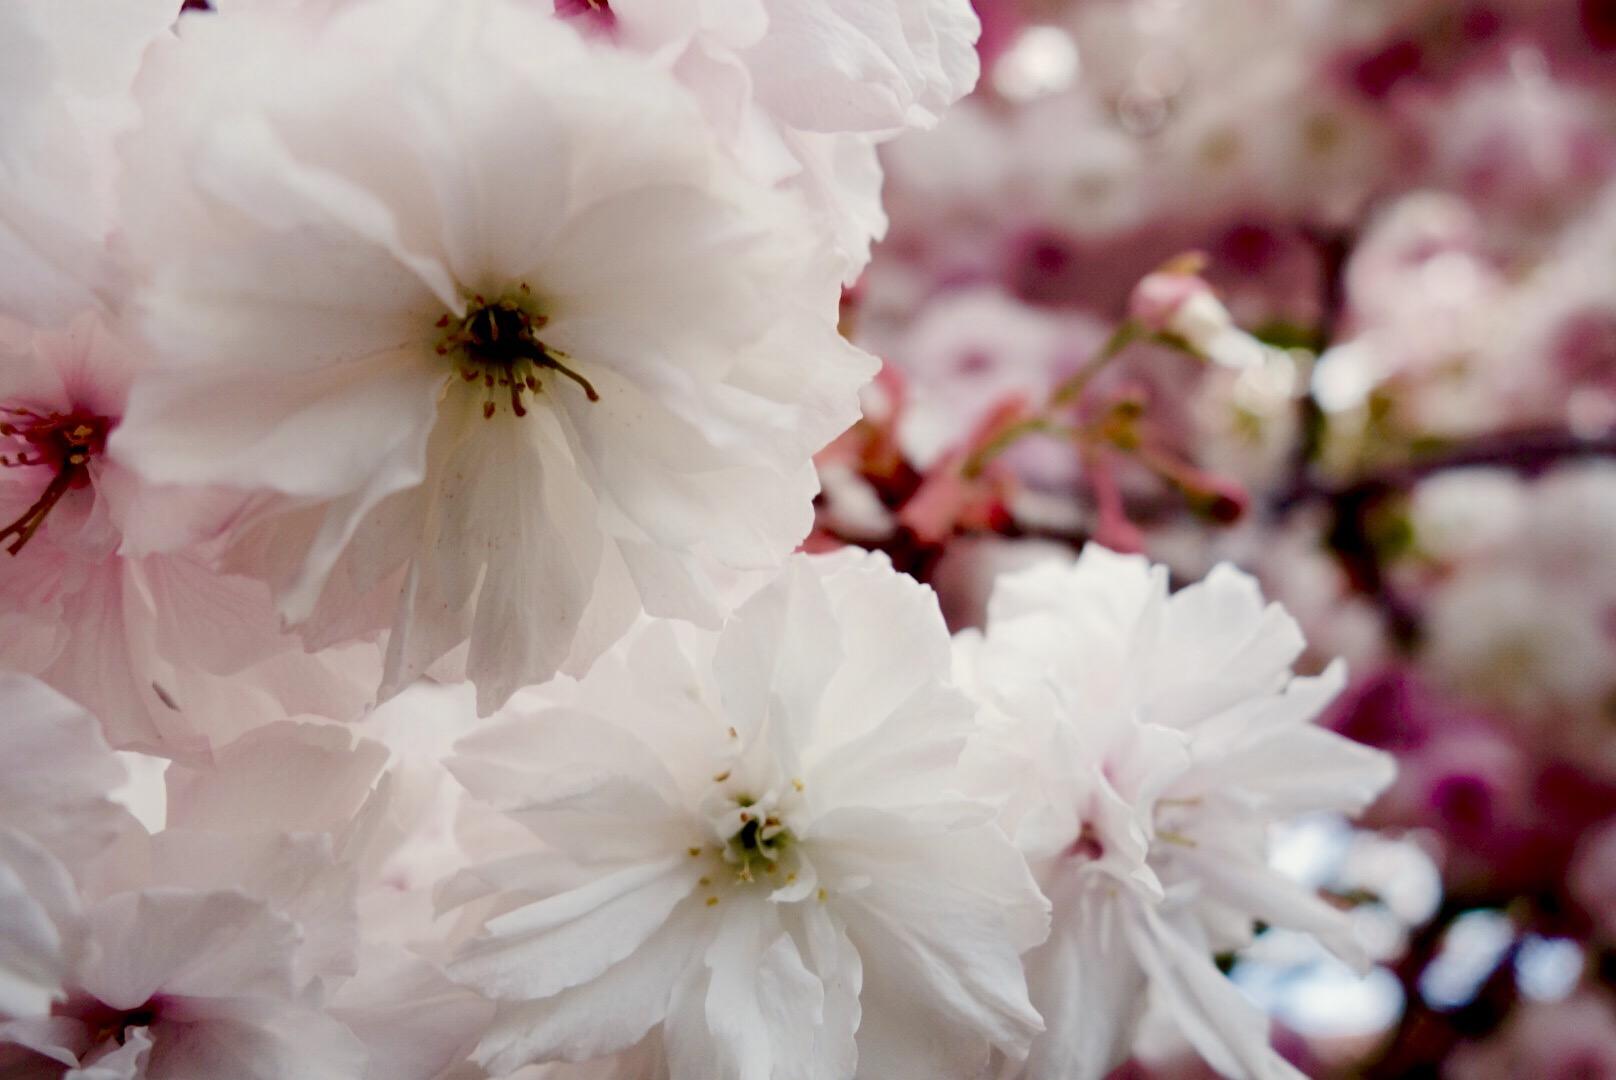 Springing